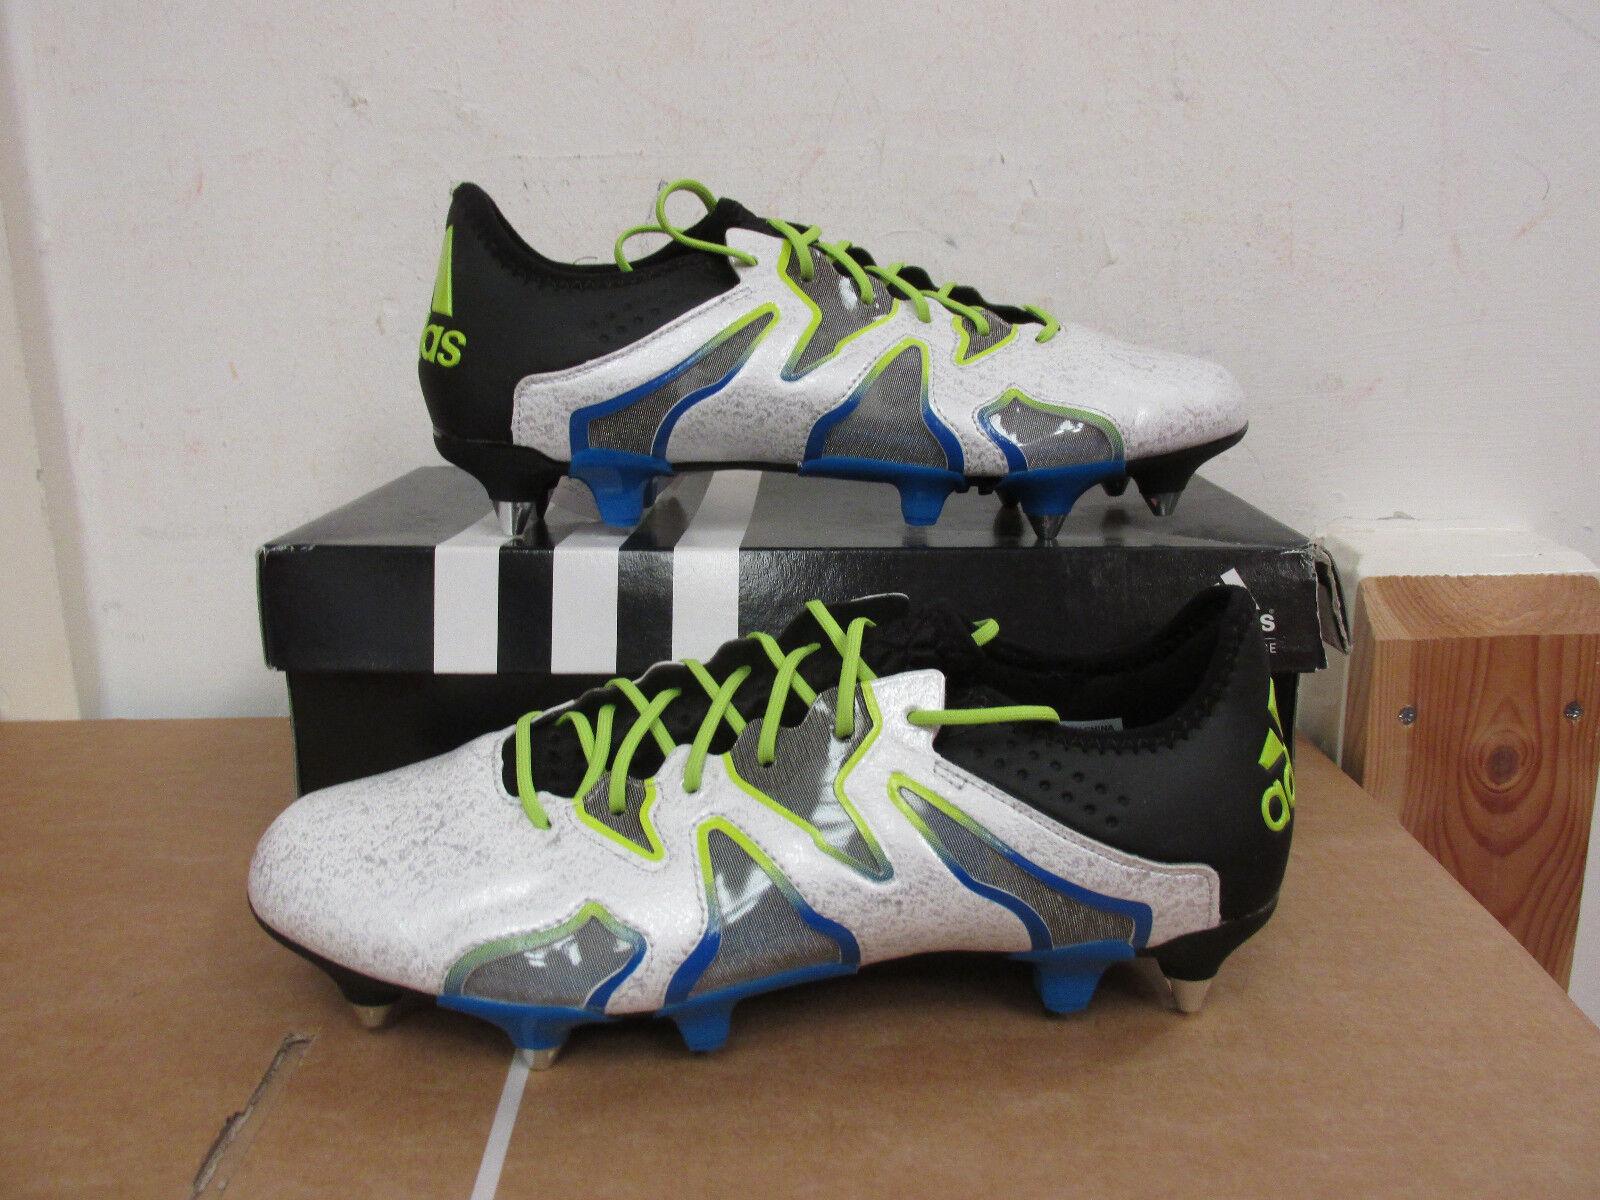 Adidas X 15+ SL SG (promo) AQ2087 Para hombre botas De Fútbol Soccer Cleats aclaramiento